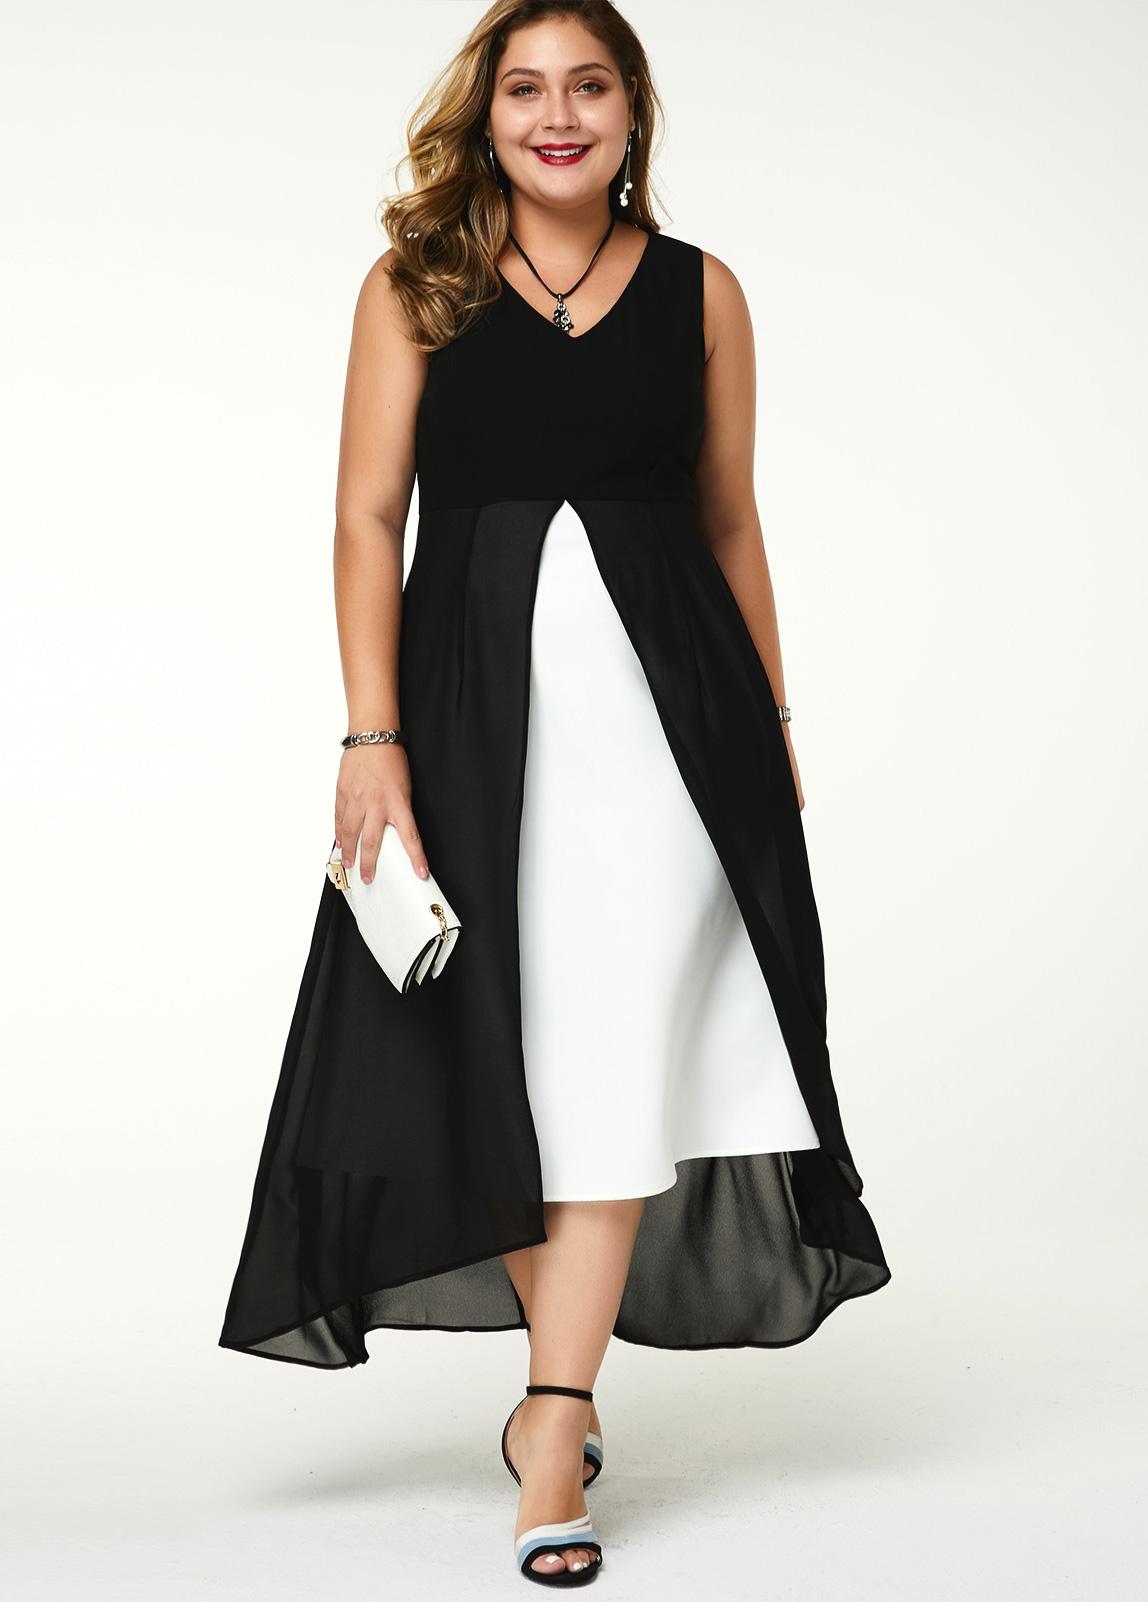 Plus Size Contrast Sleeveless V Neck Dress